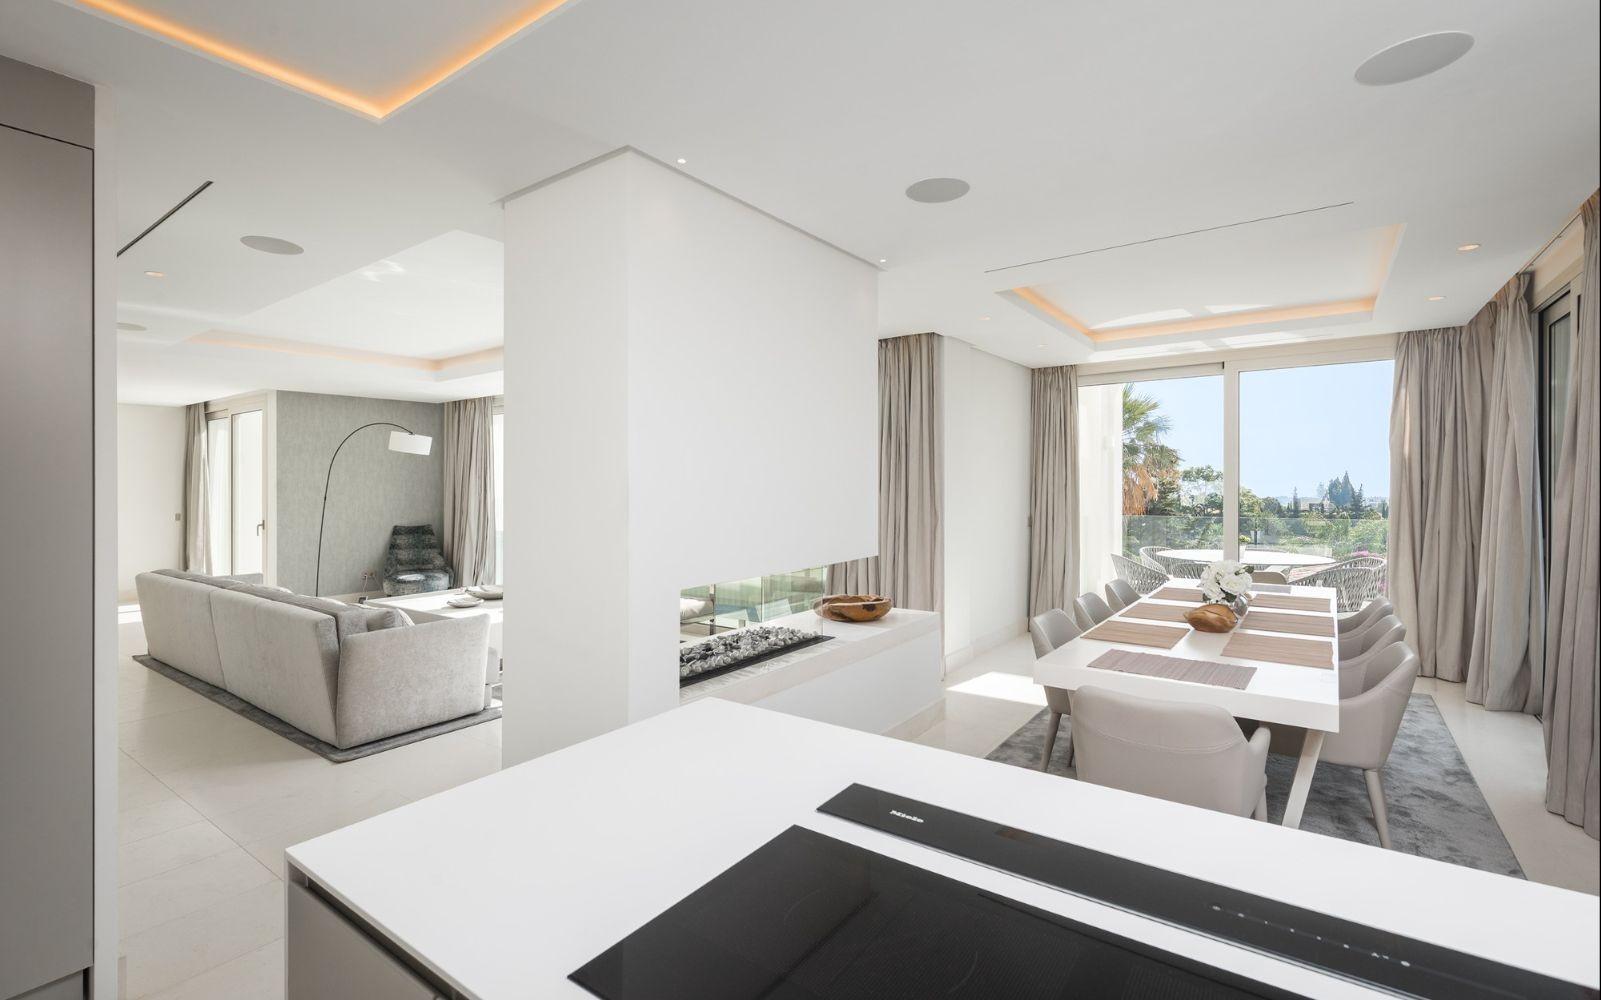 Detached Villa in Marbella - Resale in Lexington Realty